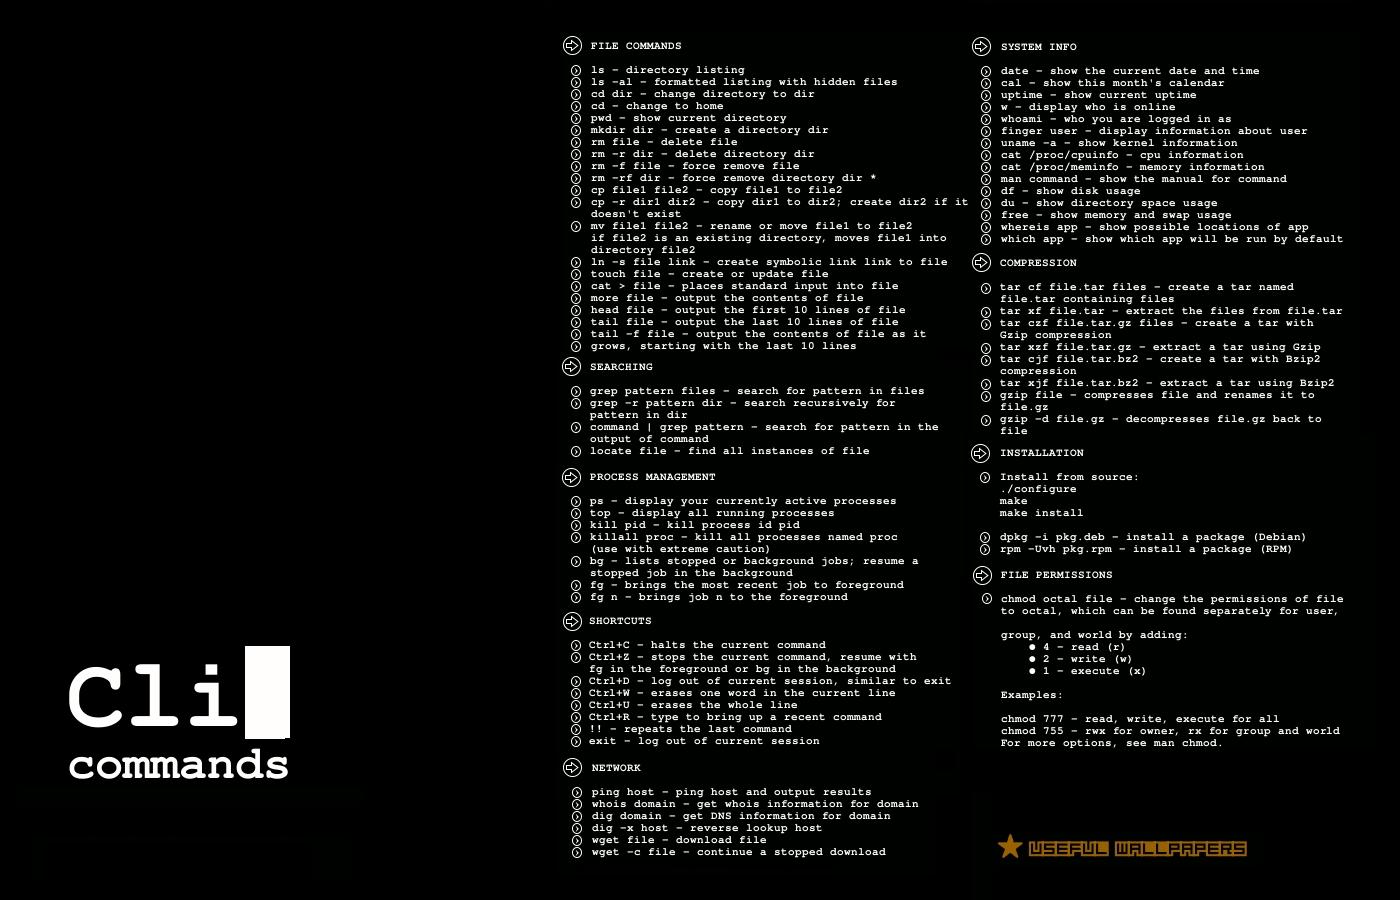 cli_commands-1400x900